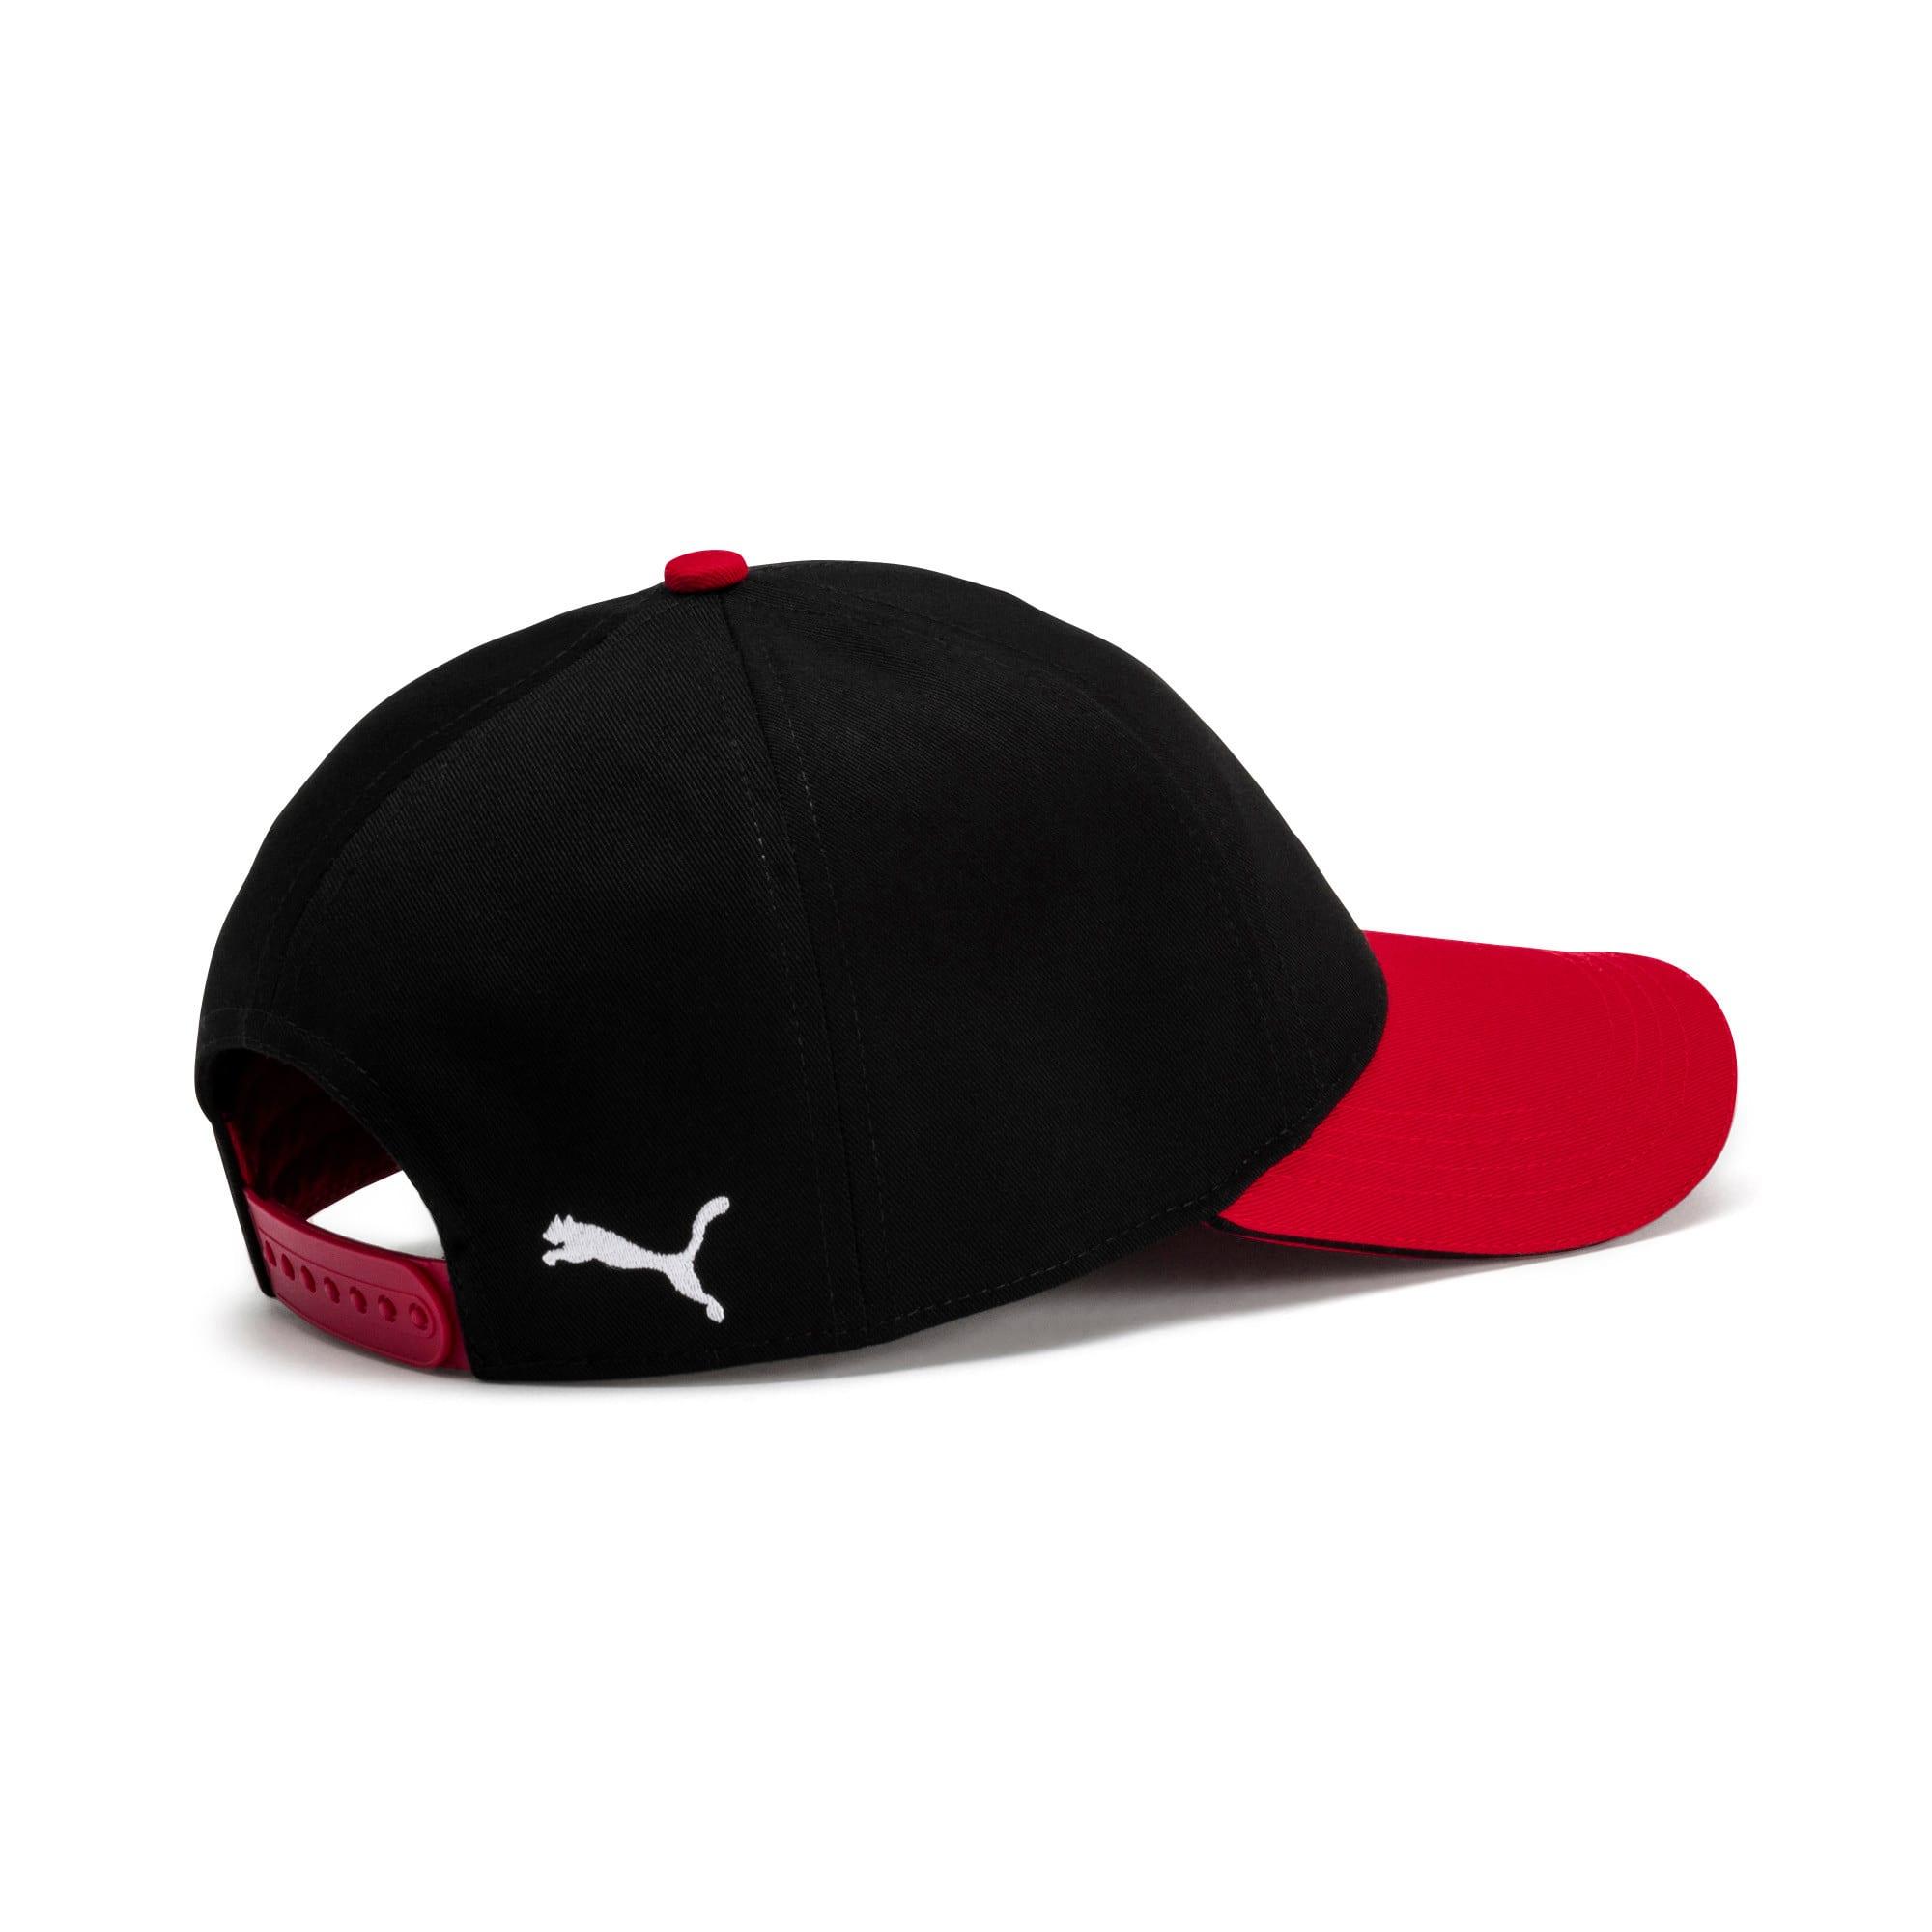 Thumbnail 2 of AC Milan Training Cap, Puma Black-Tango Red, medium